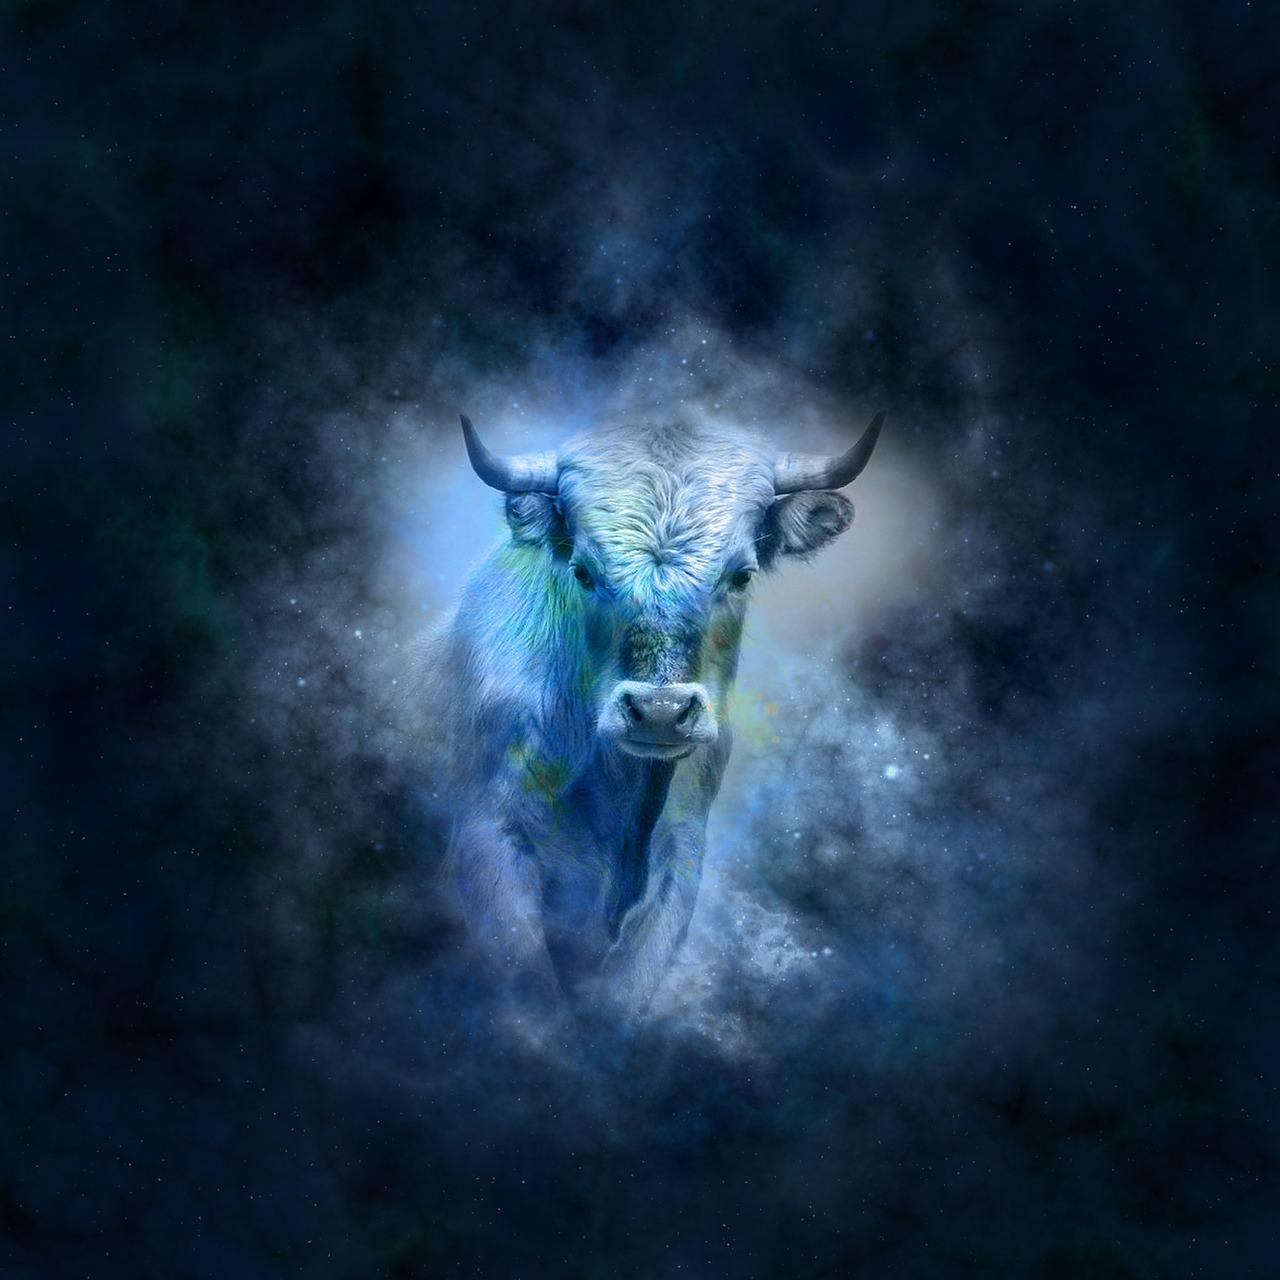 The Raging Bull: The Slender Man Part Two